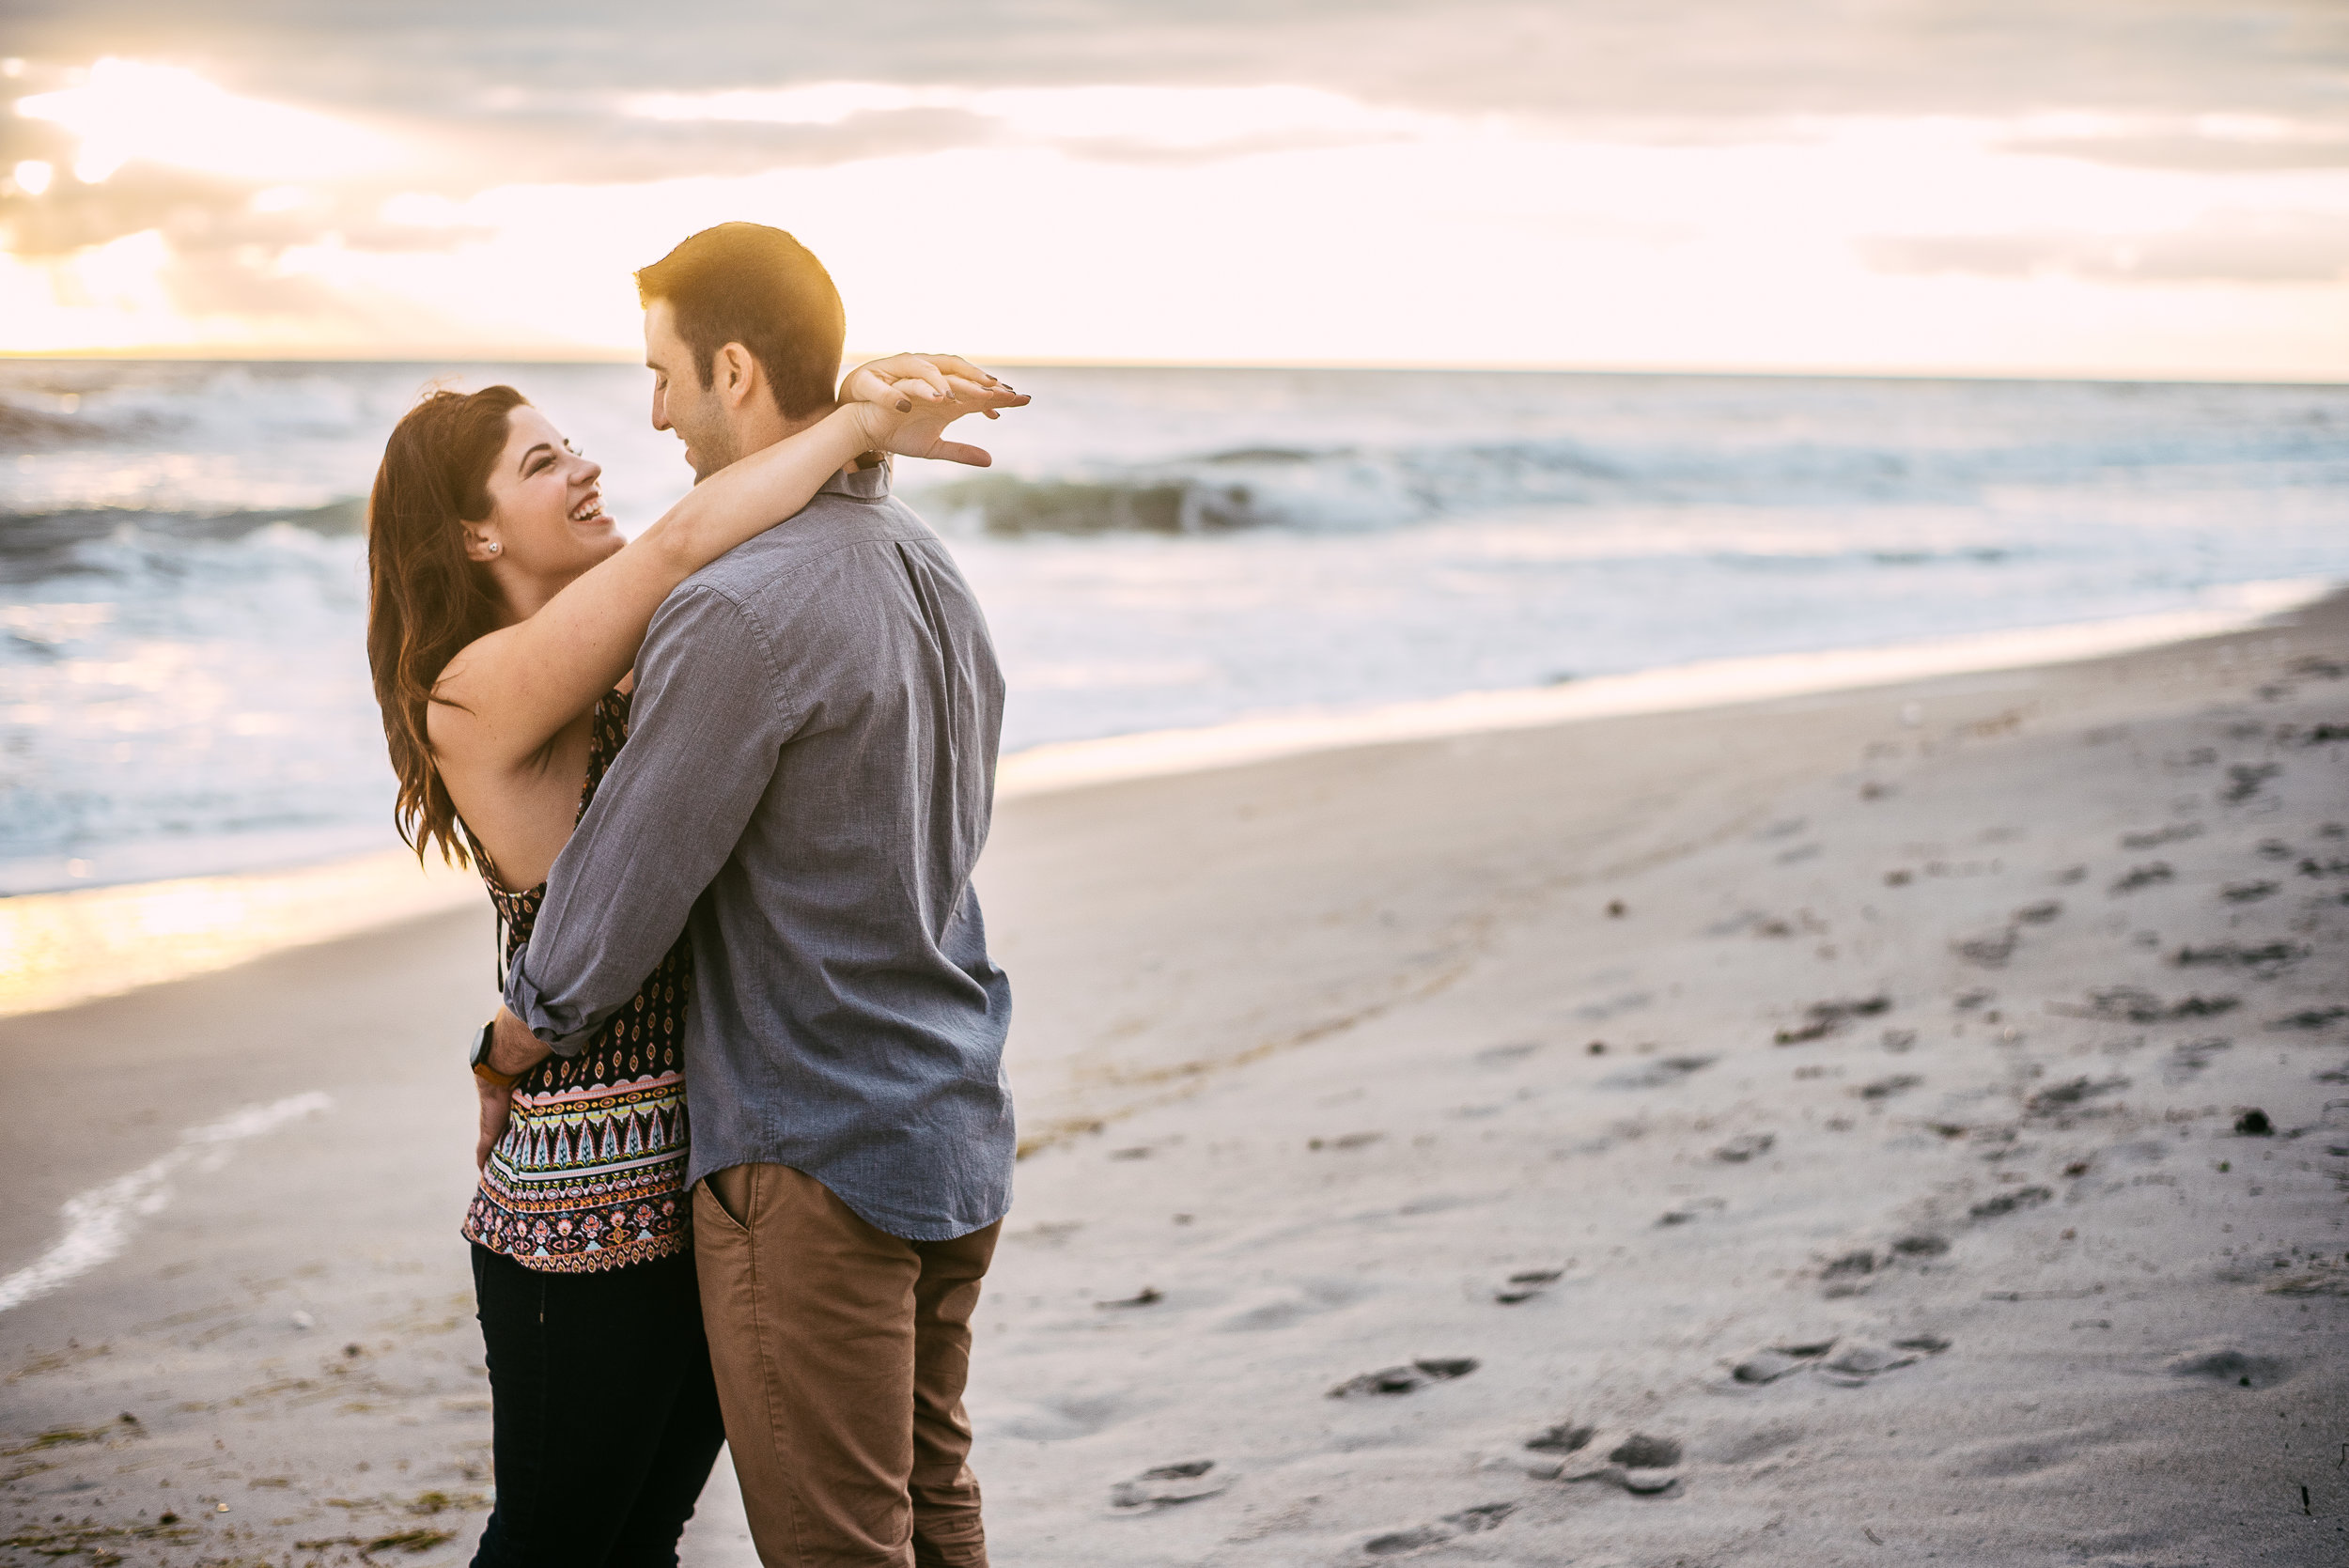 jenna-florida-beach-engagement-photo-1-39.jpg